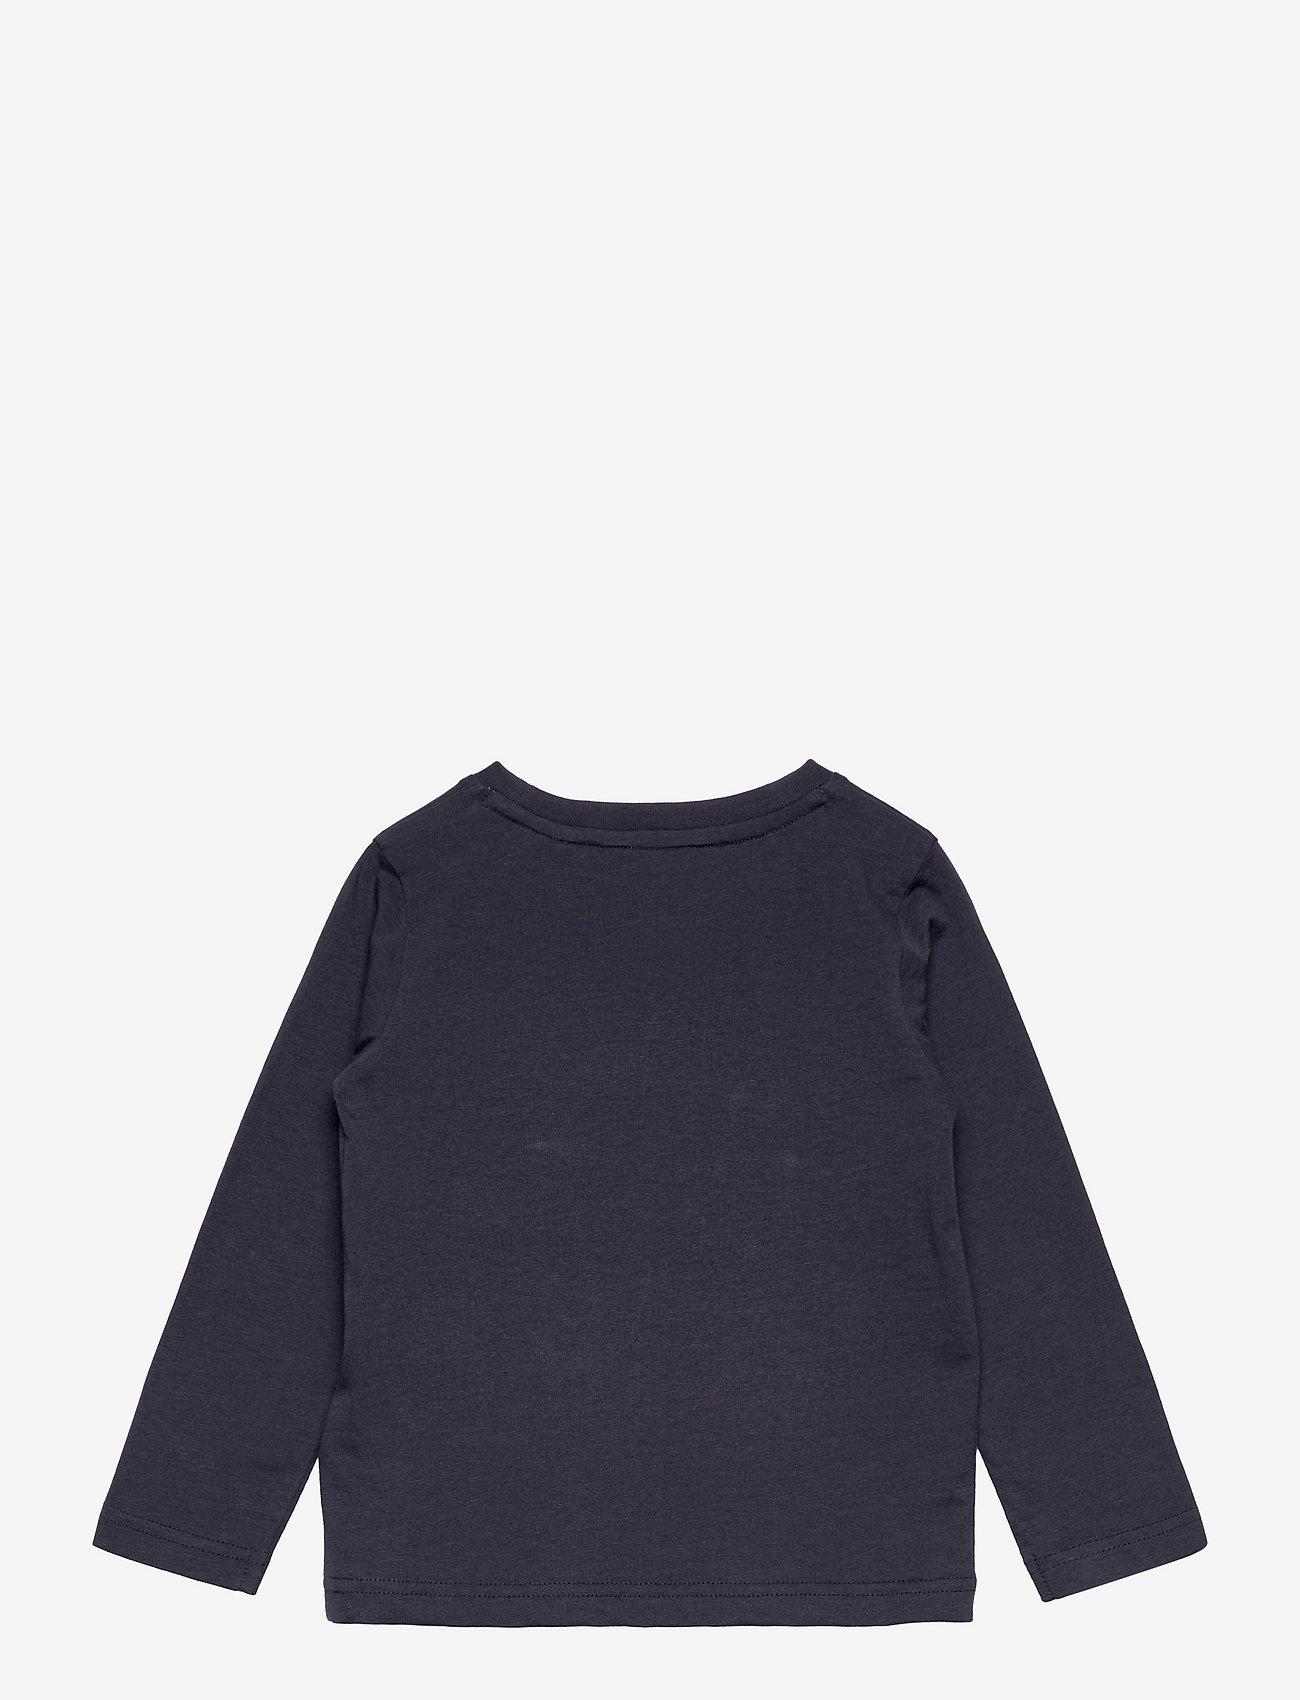 GANT - ARCHIVE SHIELD LS T-SHIRT - long-sleeved - evening blue - 1